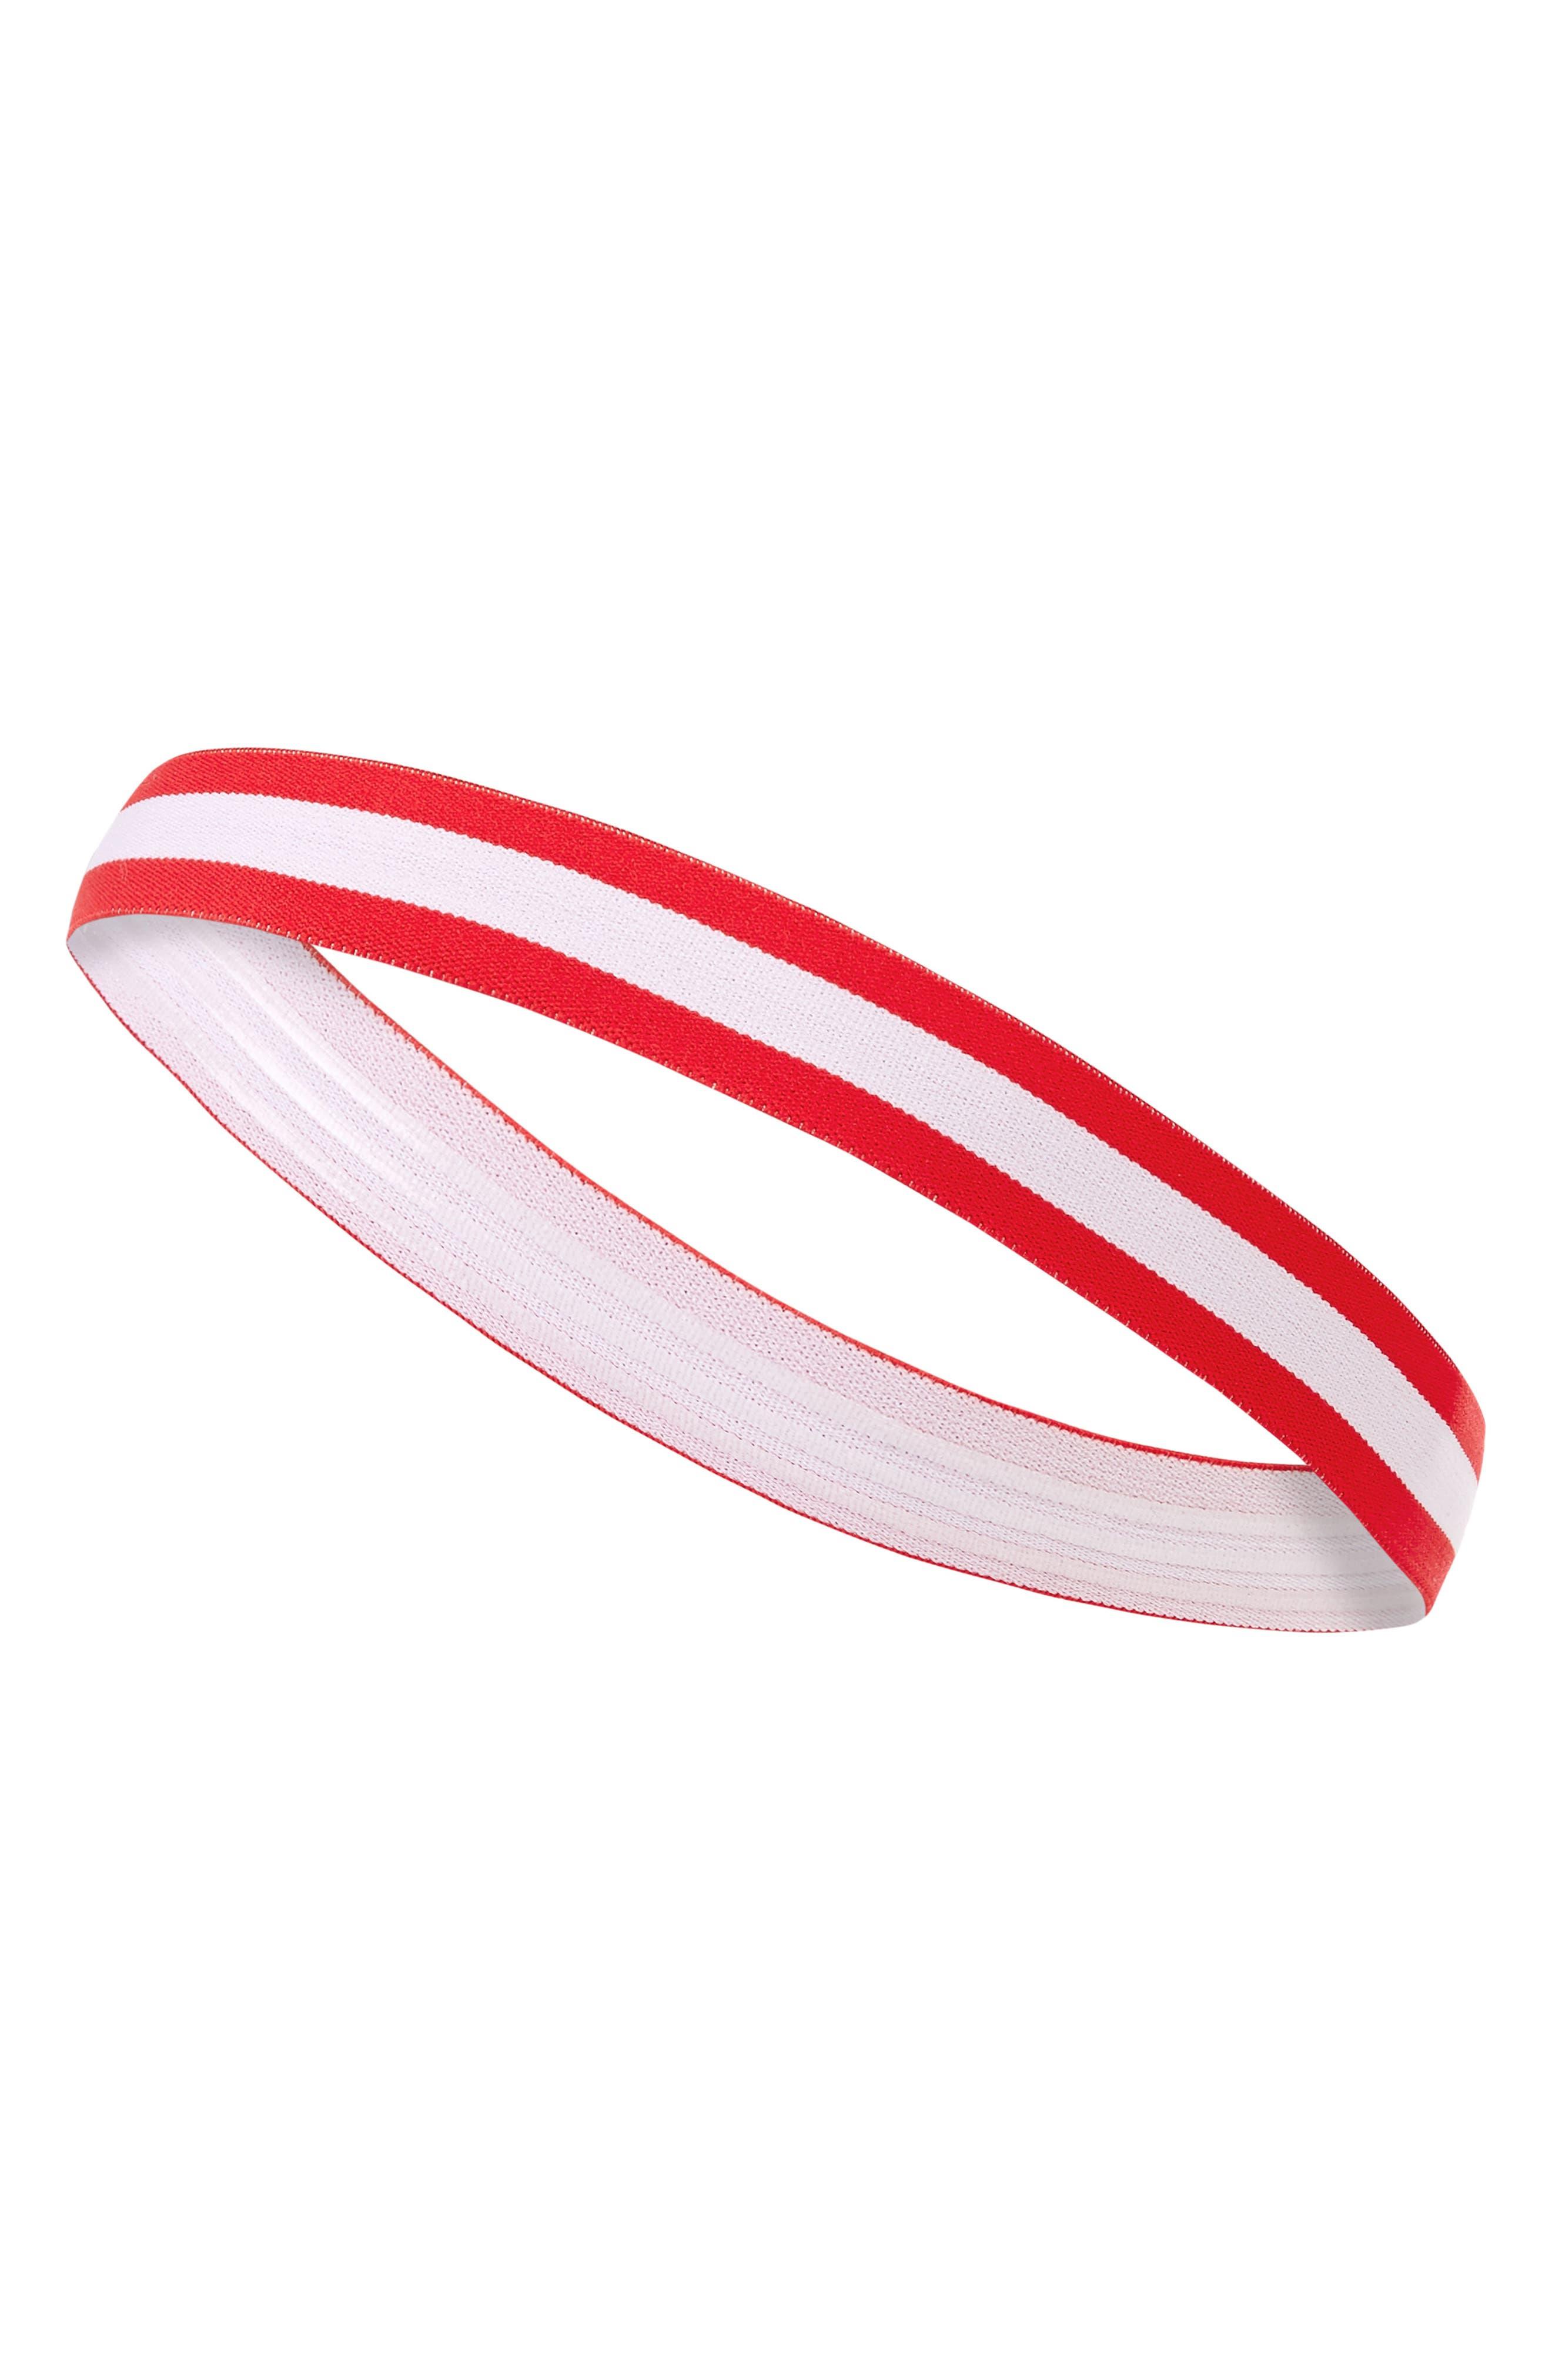 Medium Headband,                             Main thumbnail 1, color,                             Red/ White